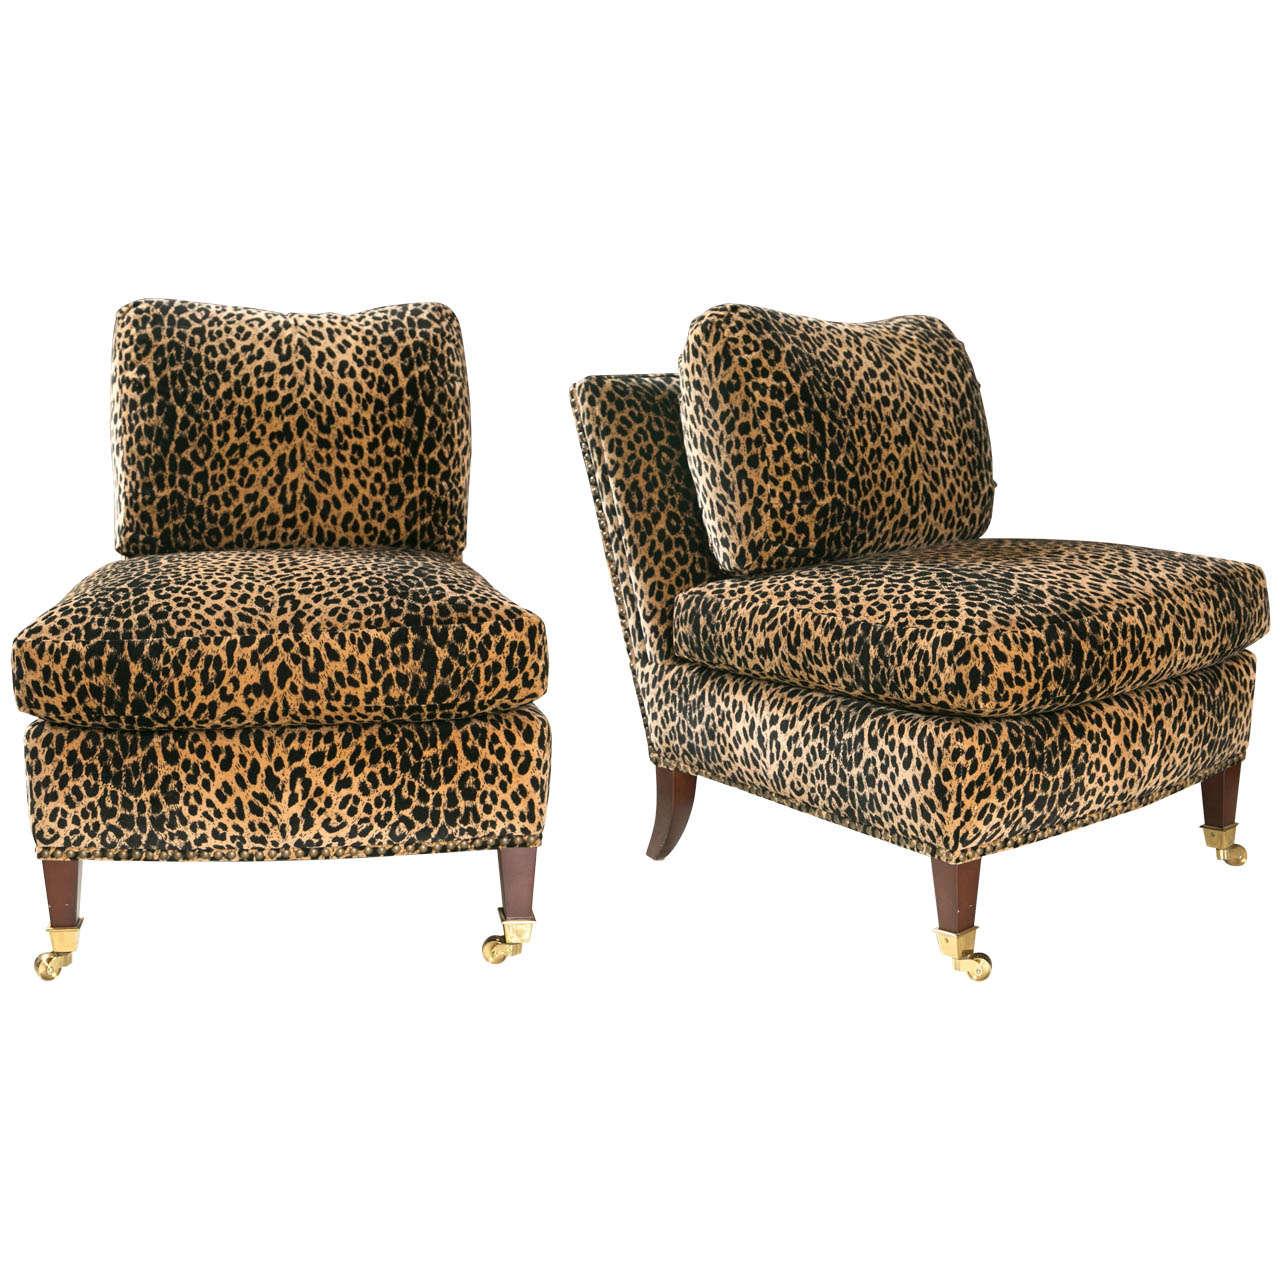 giraffe print chair aeron amazon mid century lolling chairs upholstered in animal